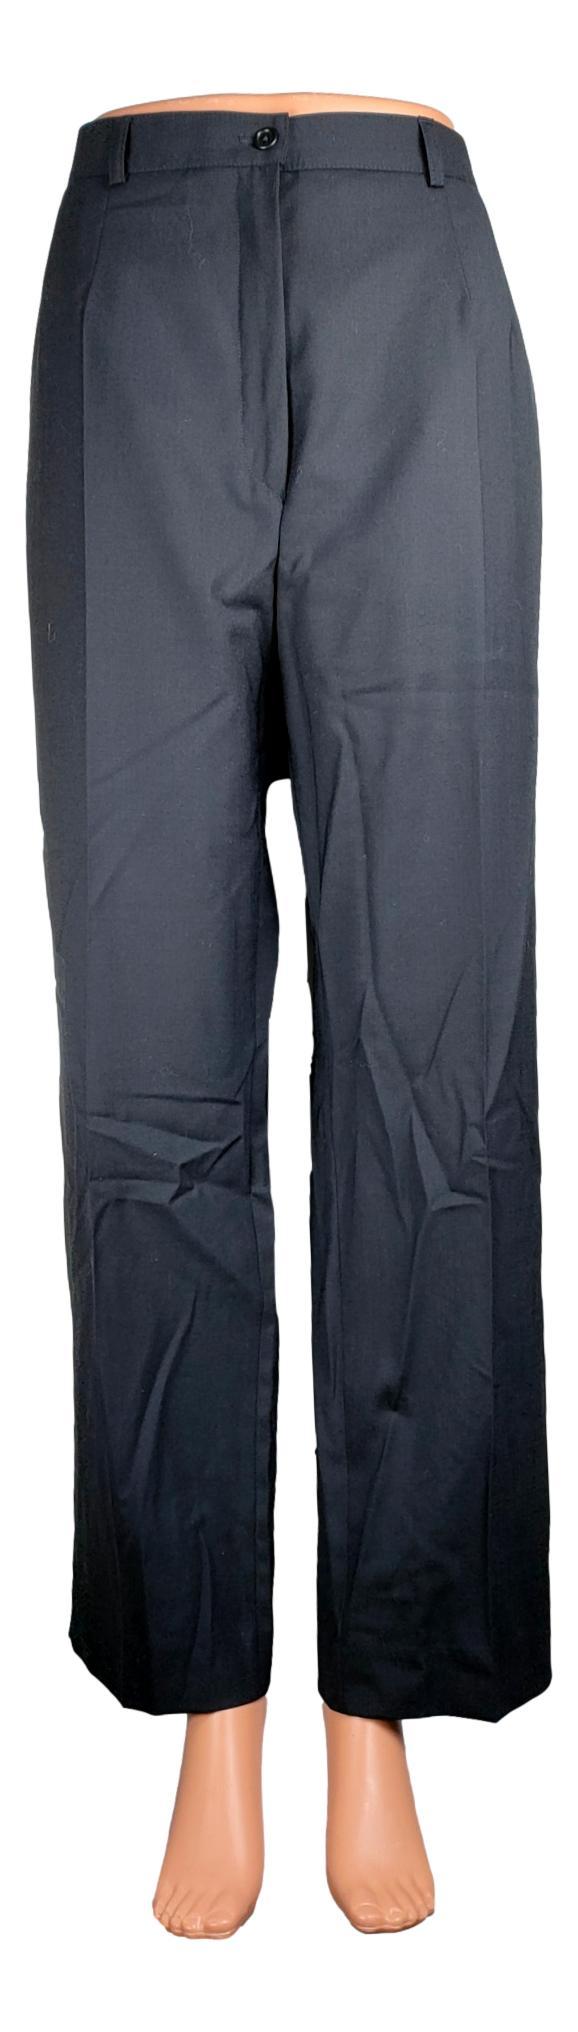 Pantalon Torre - Taille 46